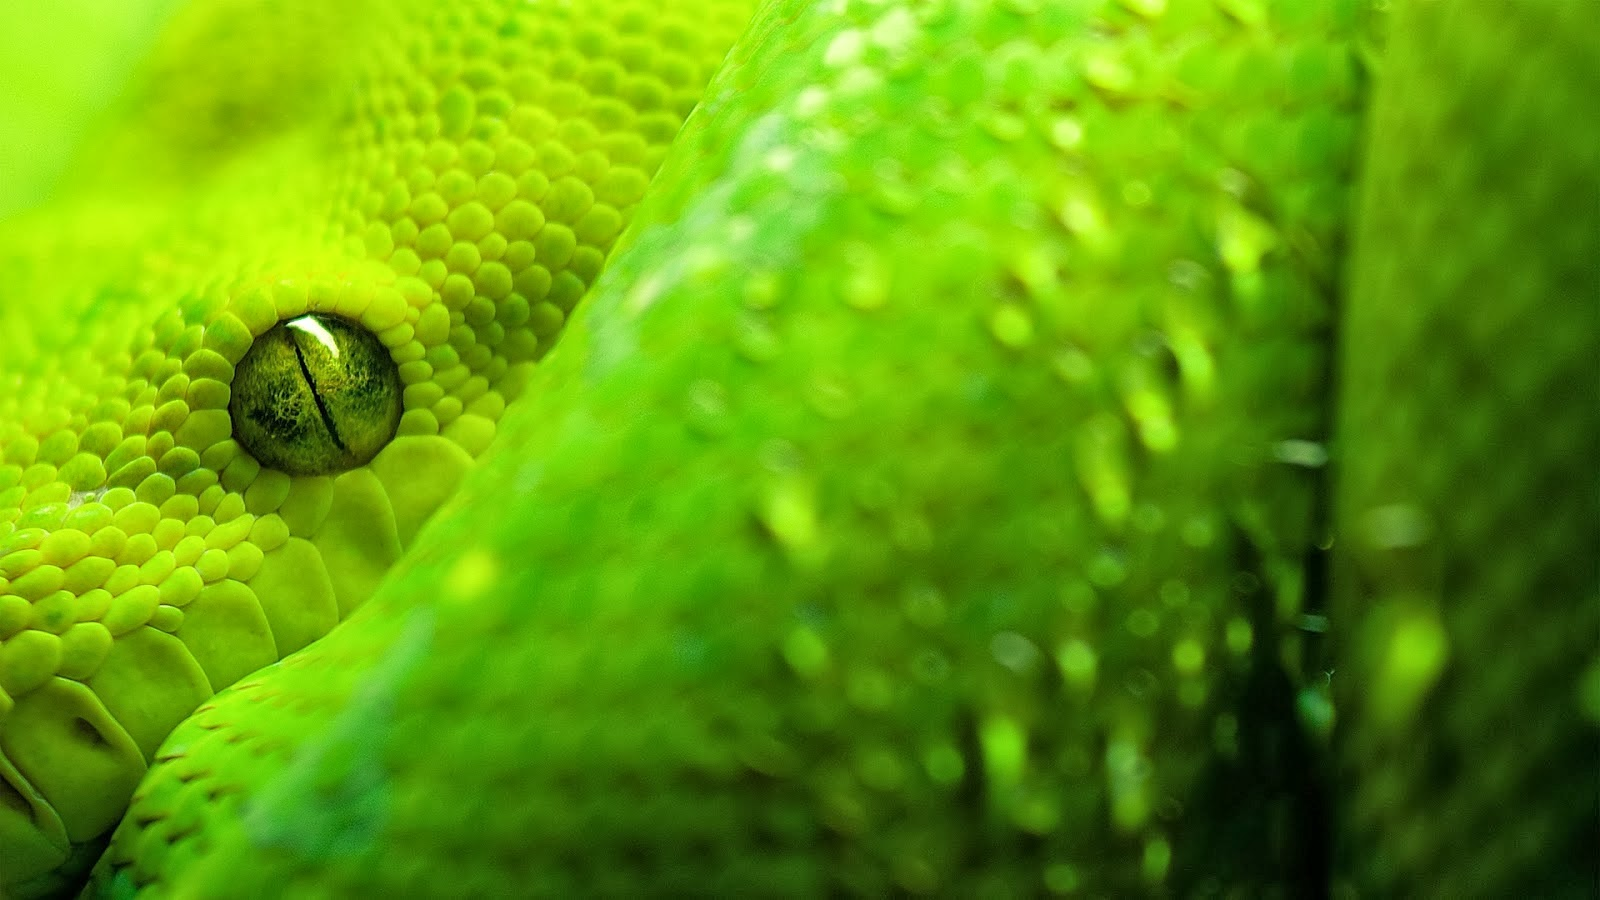 World Best Dangerous Snake HD Wallpapers